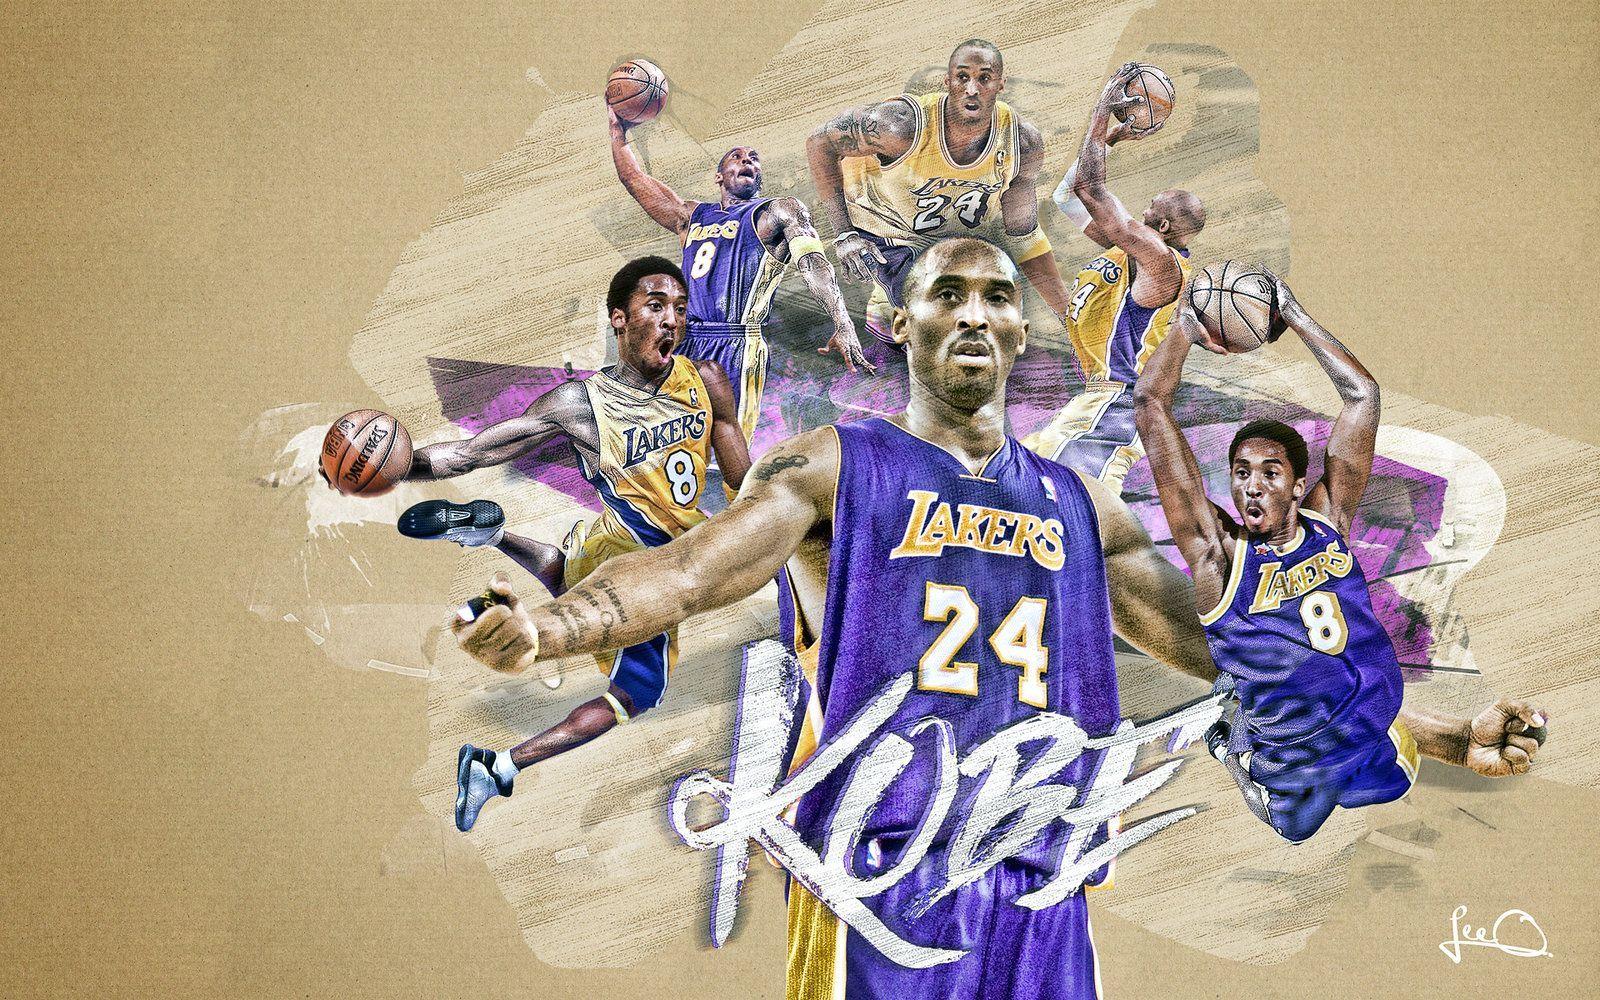 Kobe Bryant Wallpaper Hd Resolution Festival Wallpaper Kobe Bryant Wallpaper Kobe Bryant Kobe